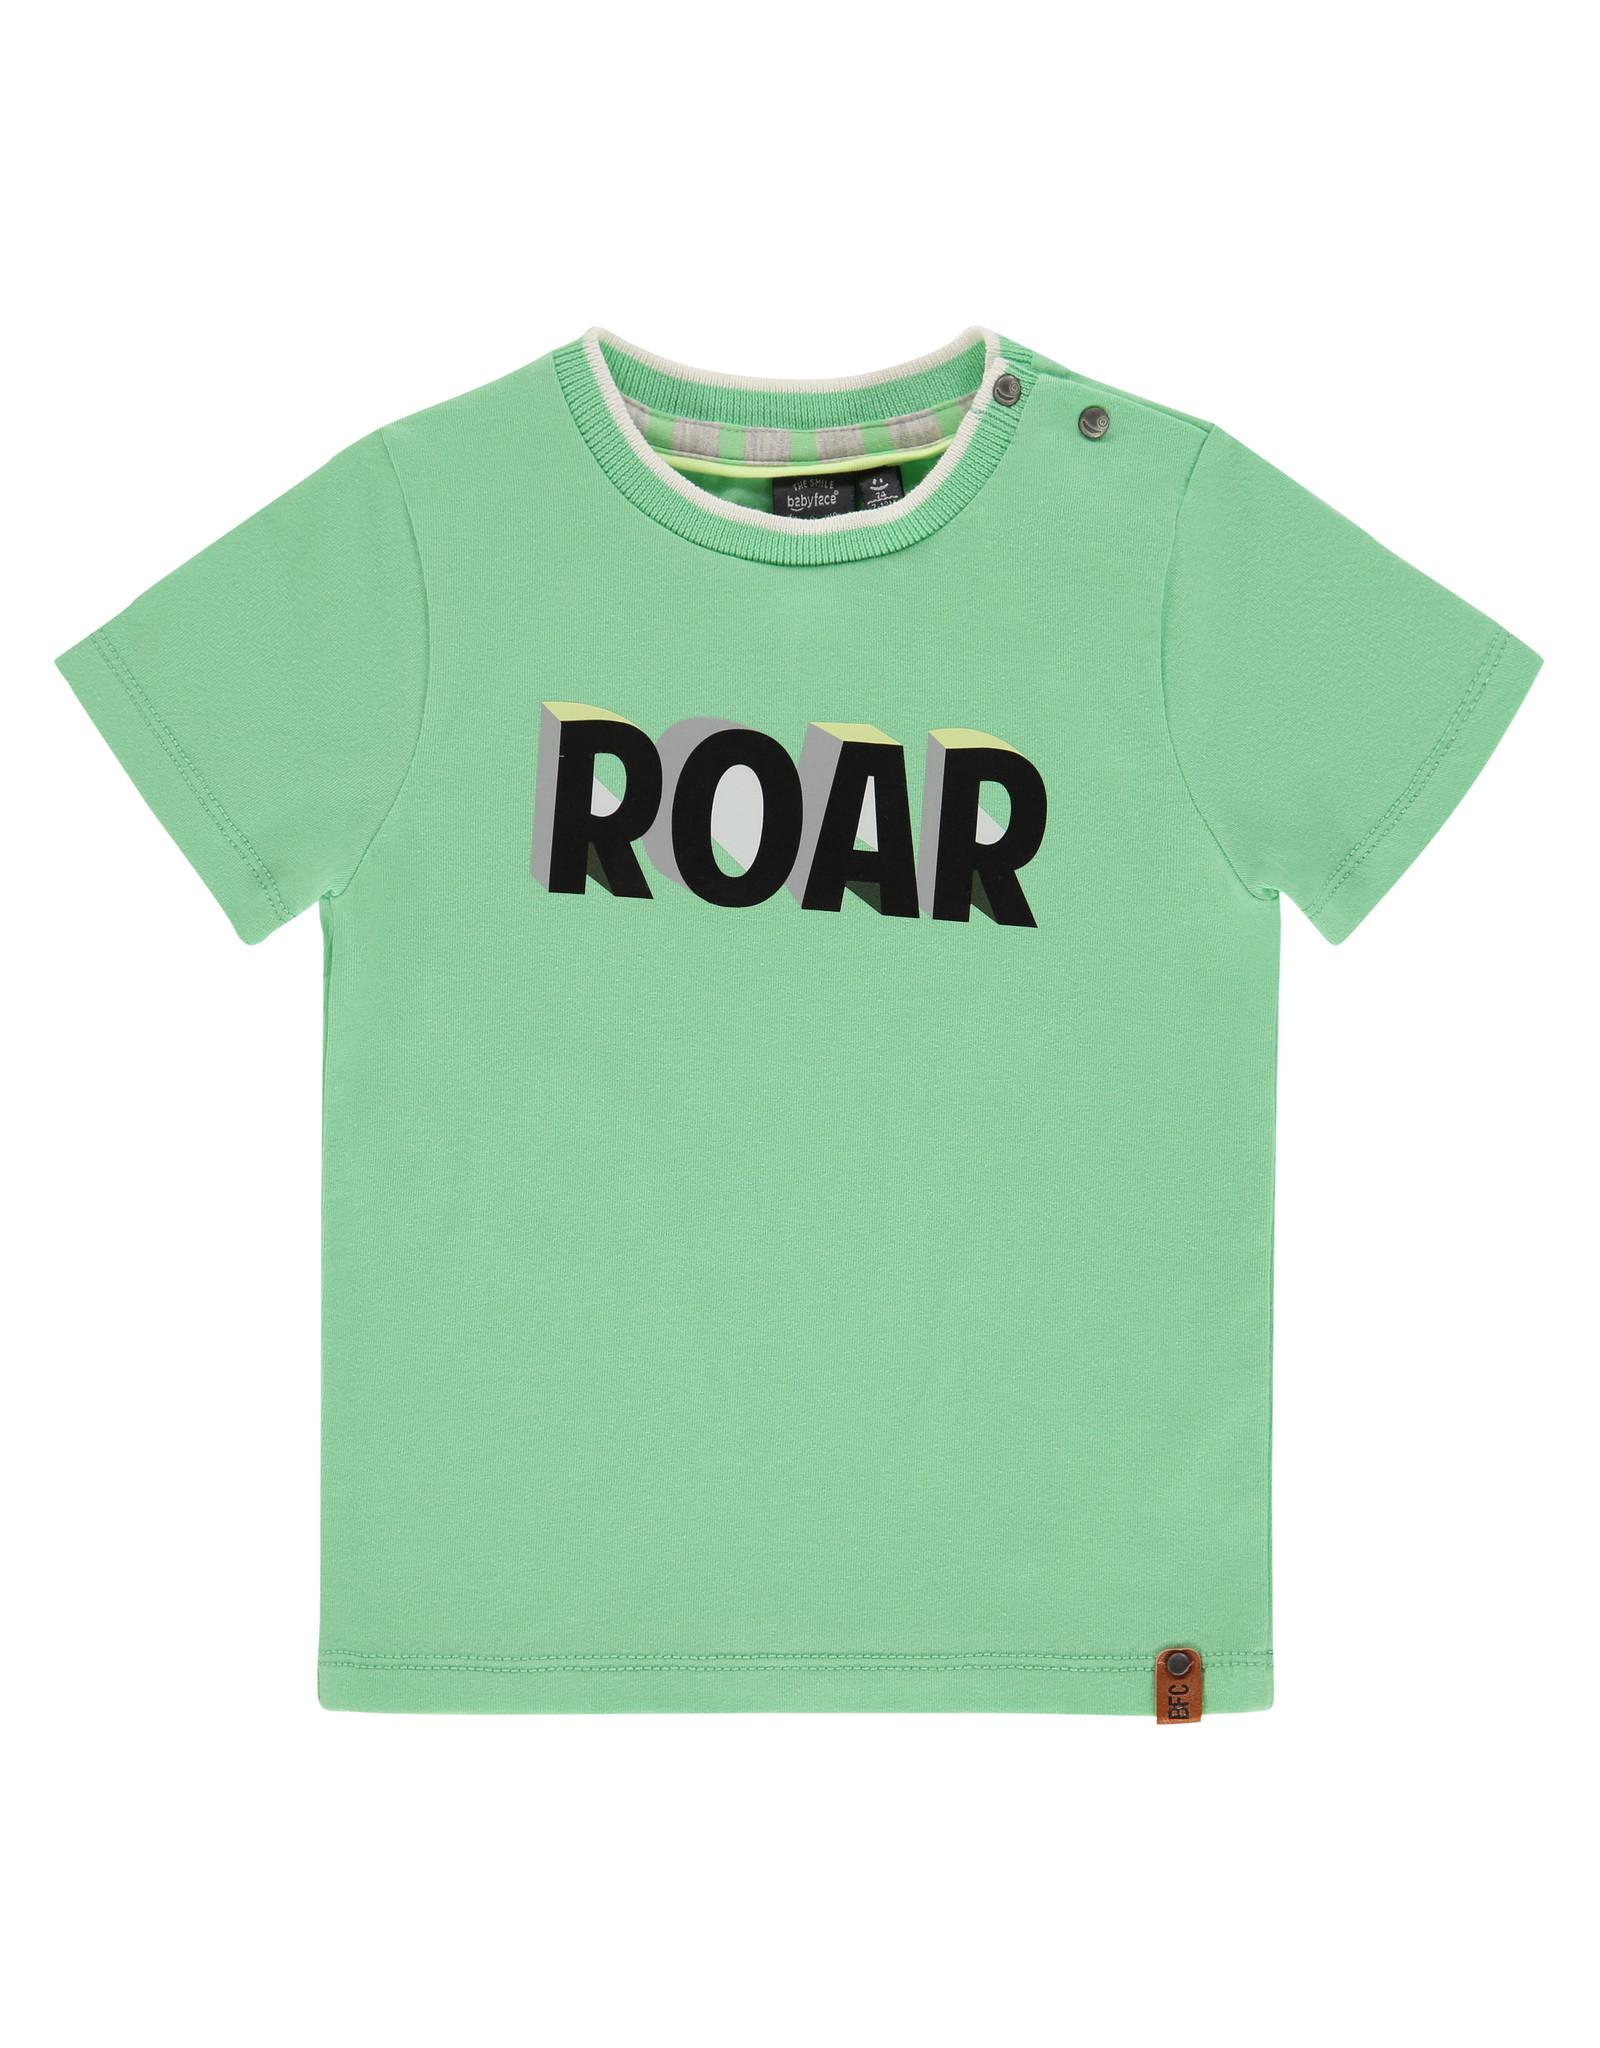 Babyface boys t-shirt short sleeve, kiwi, BBE21107611